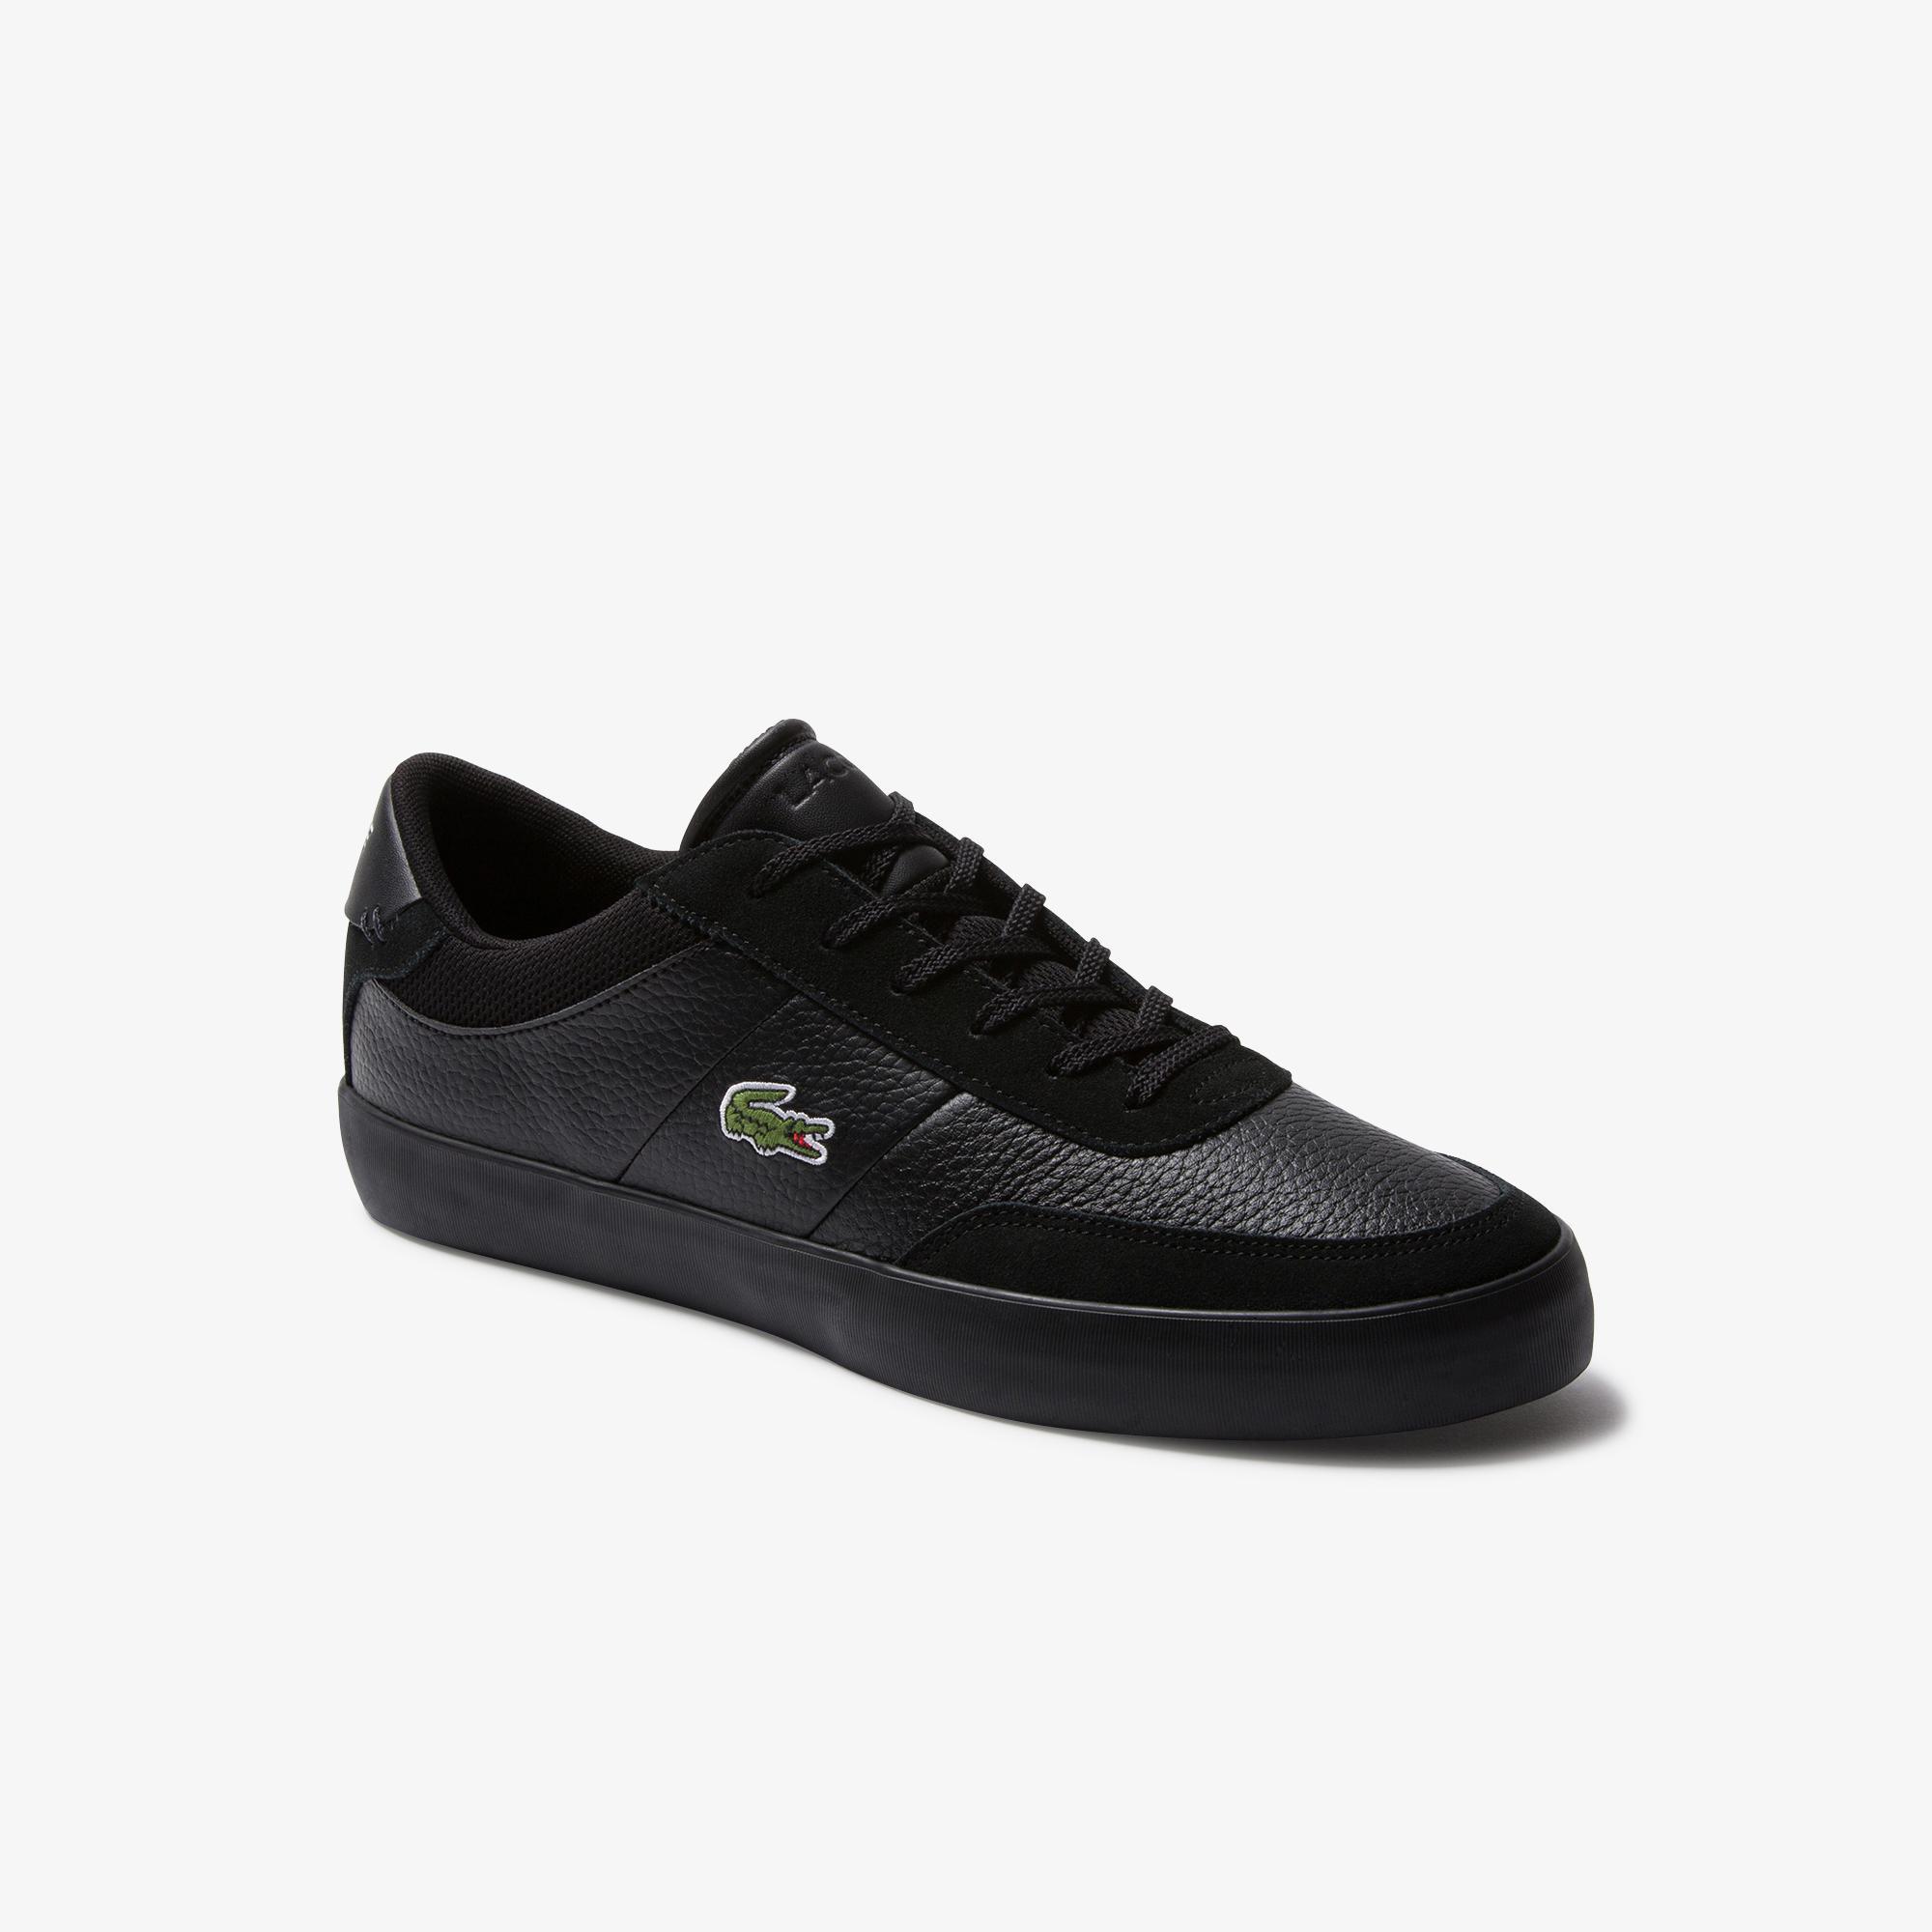 Lacoste Court-Master 120 4 Cma Erkek Siyah Deri Casual Ayakkabı